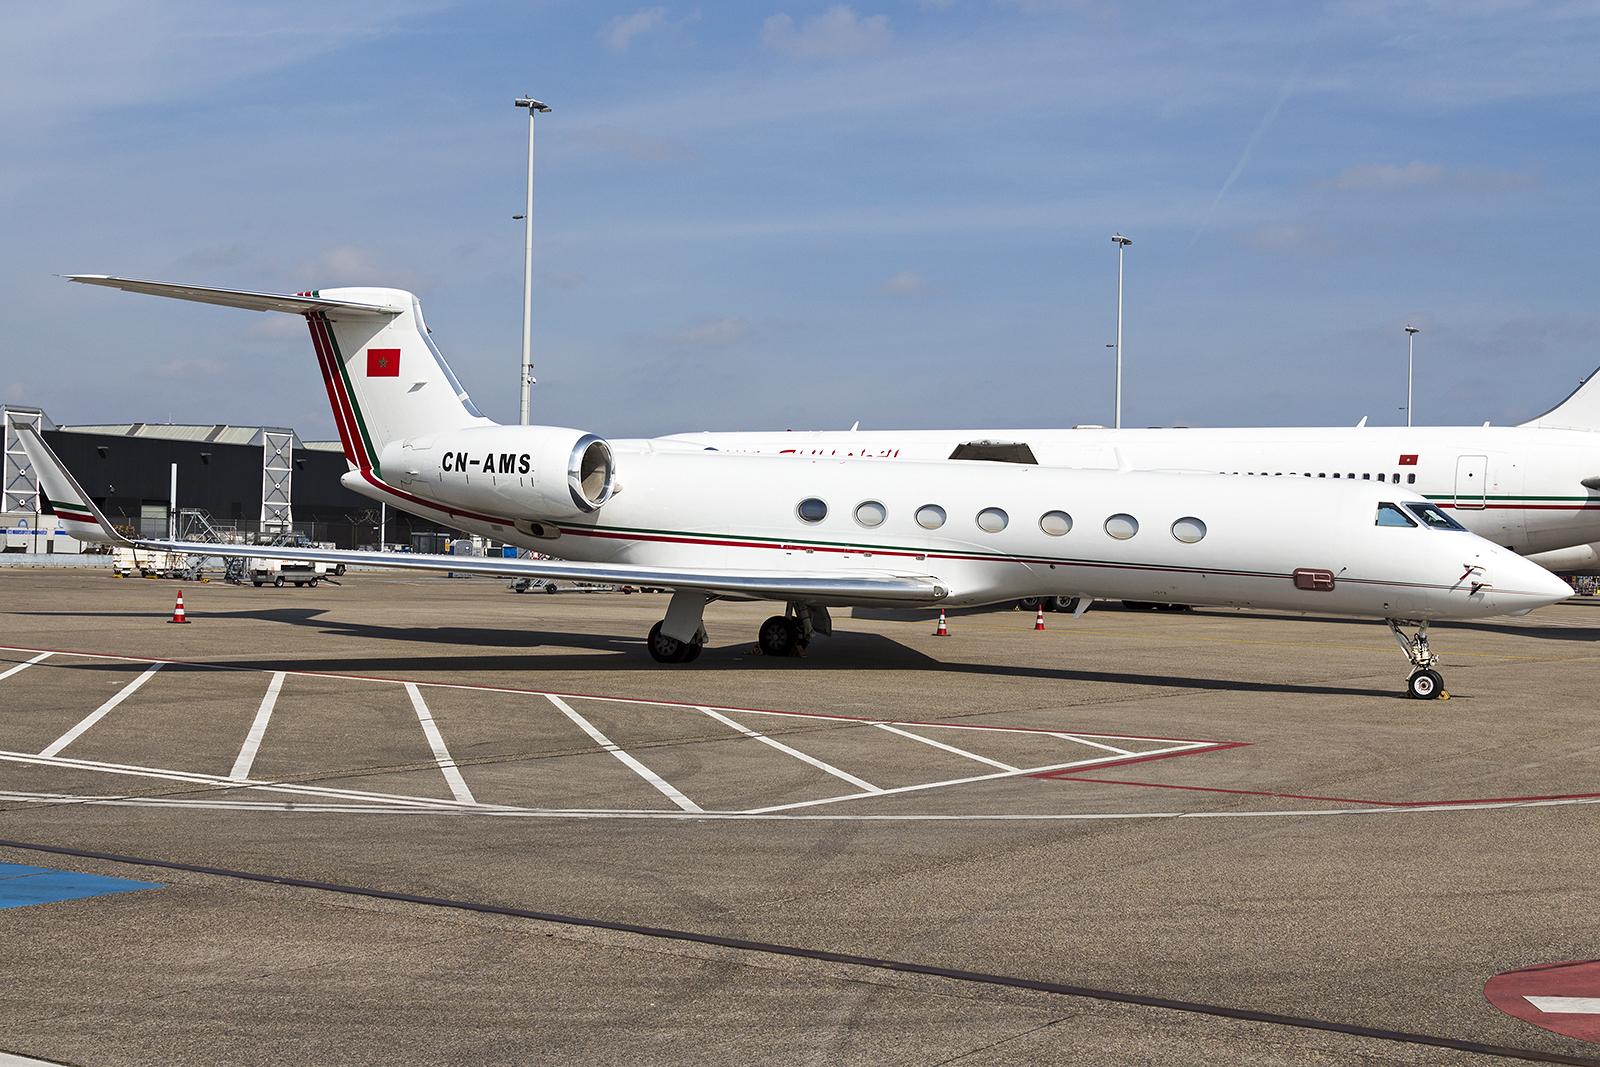 FRA: Avions VIP, Liaison & ECM - Page 12 25777309770_8172992813_o